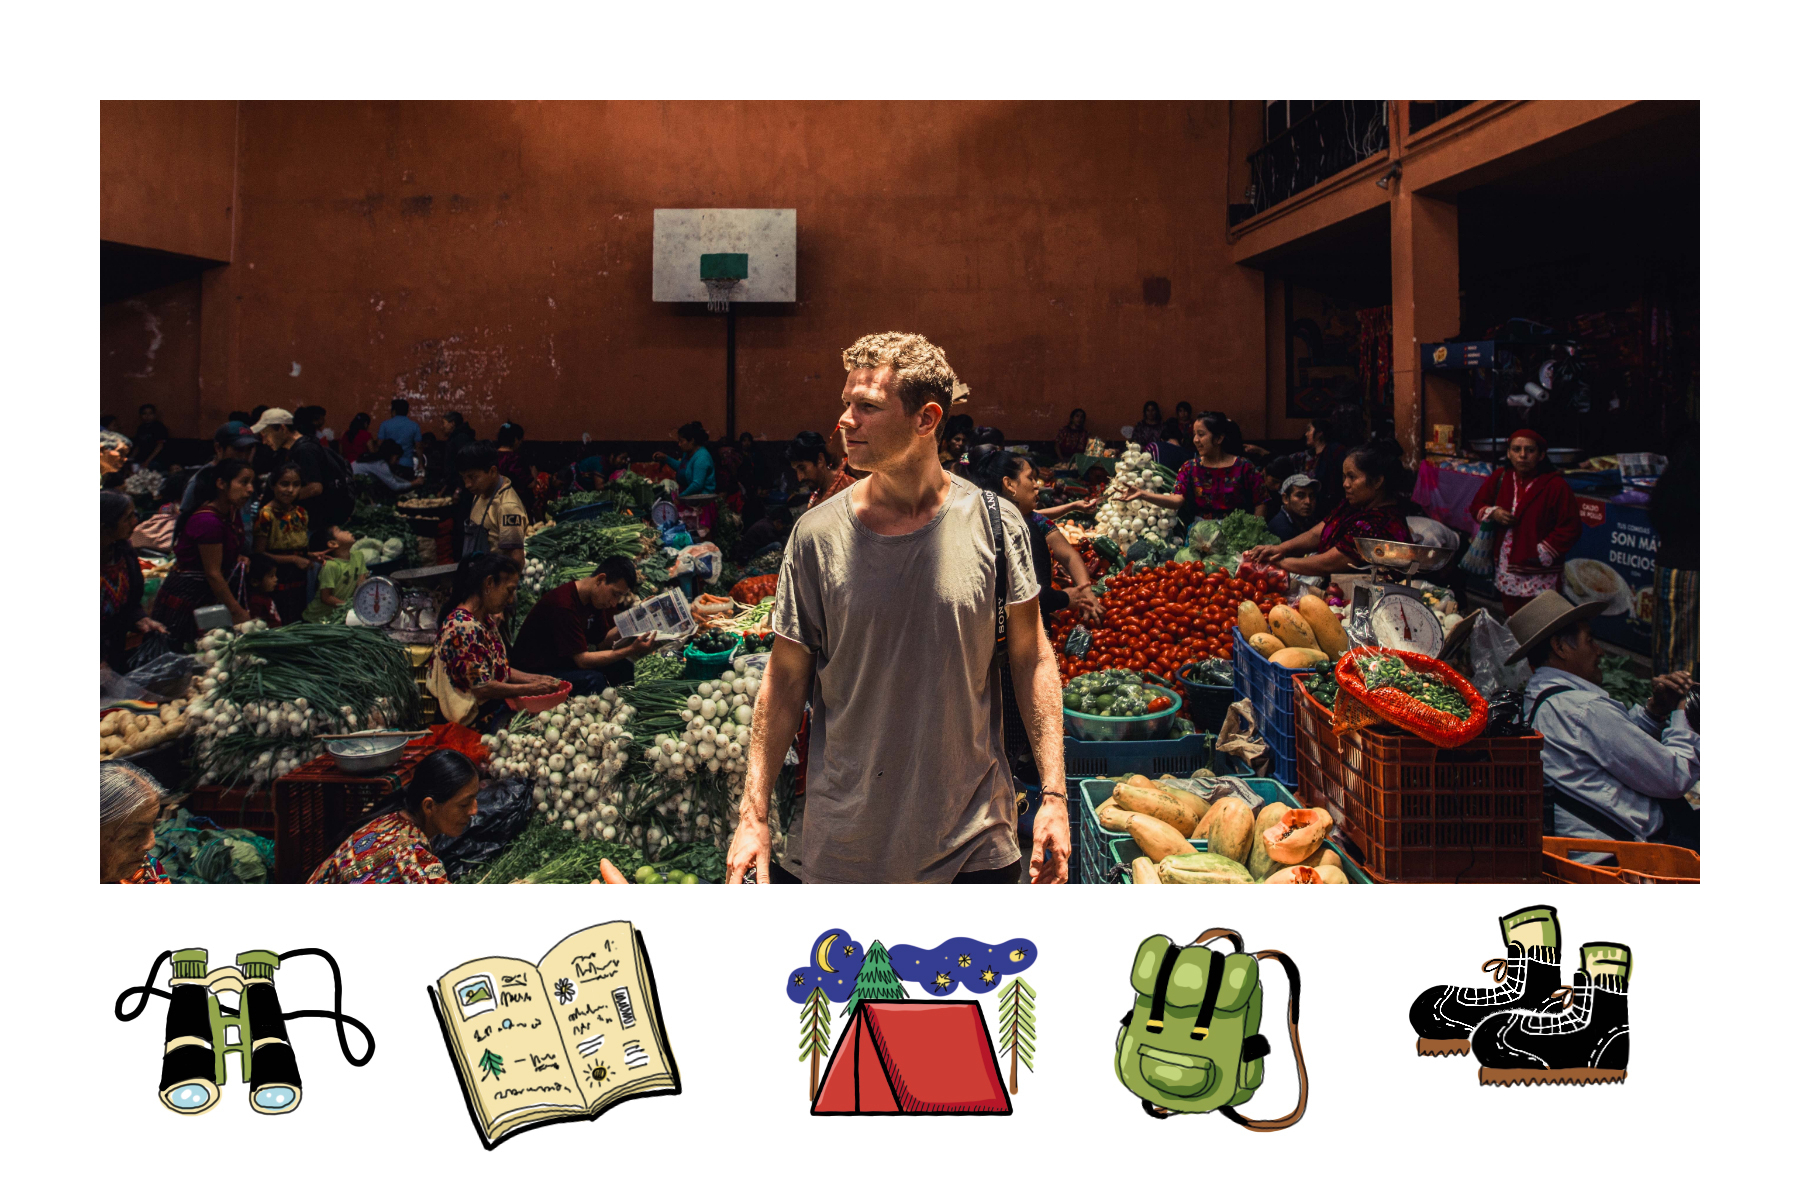 binoculars, book, tent, backpack and camera